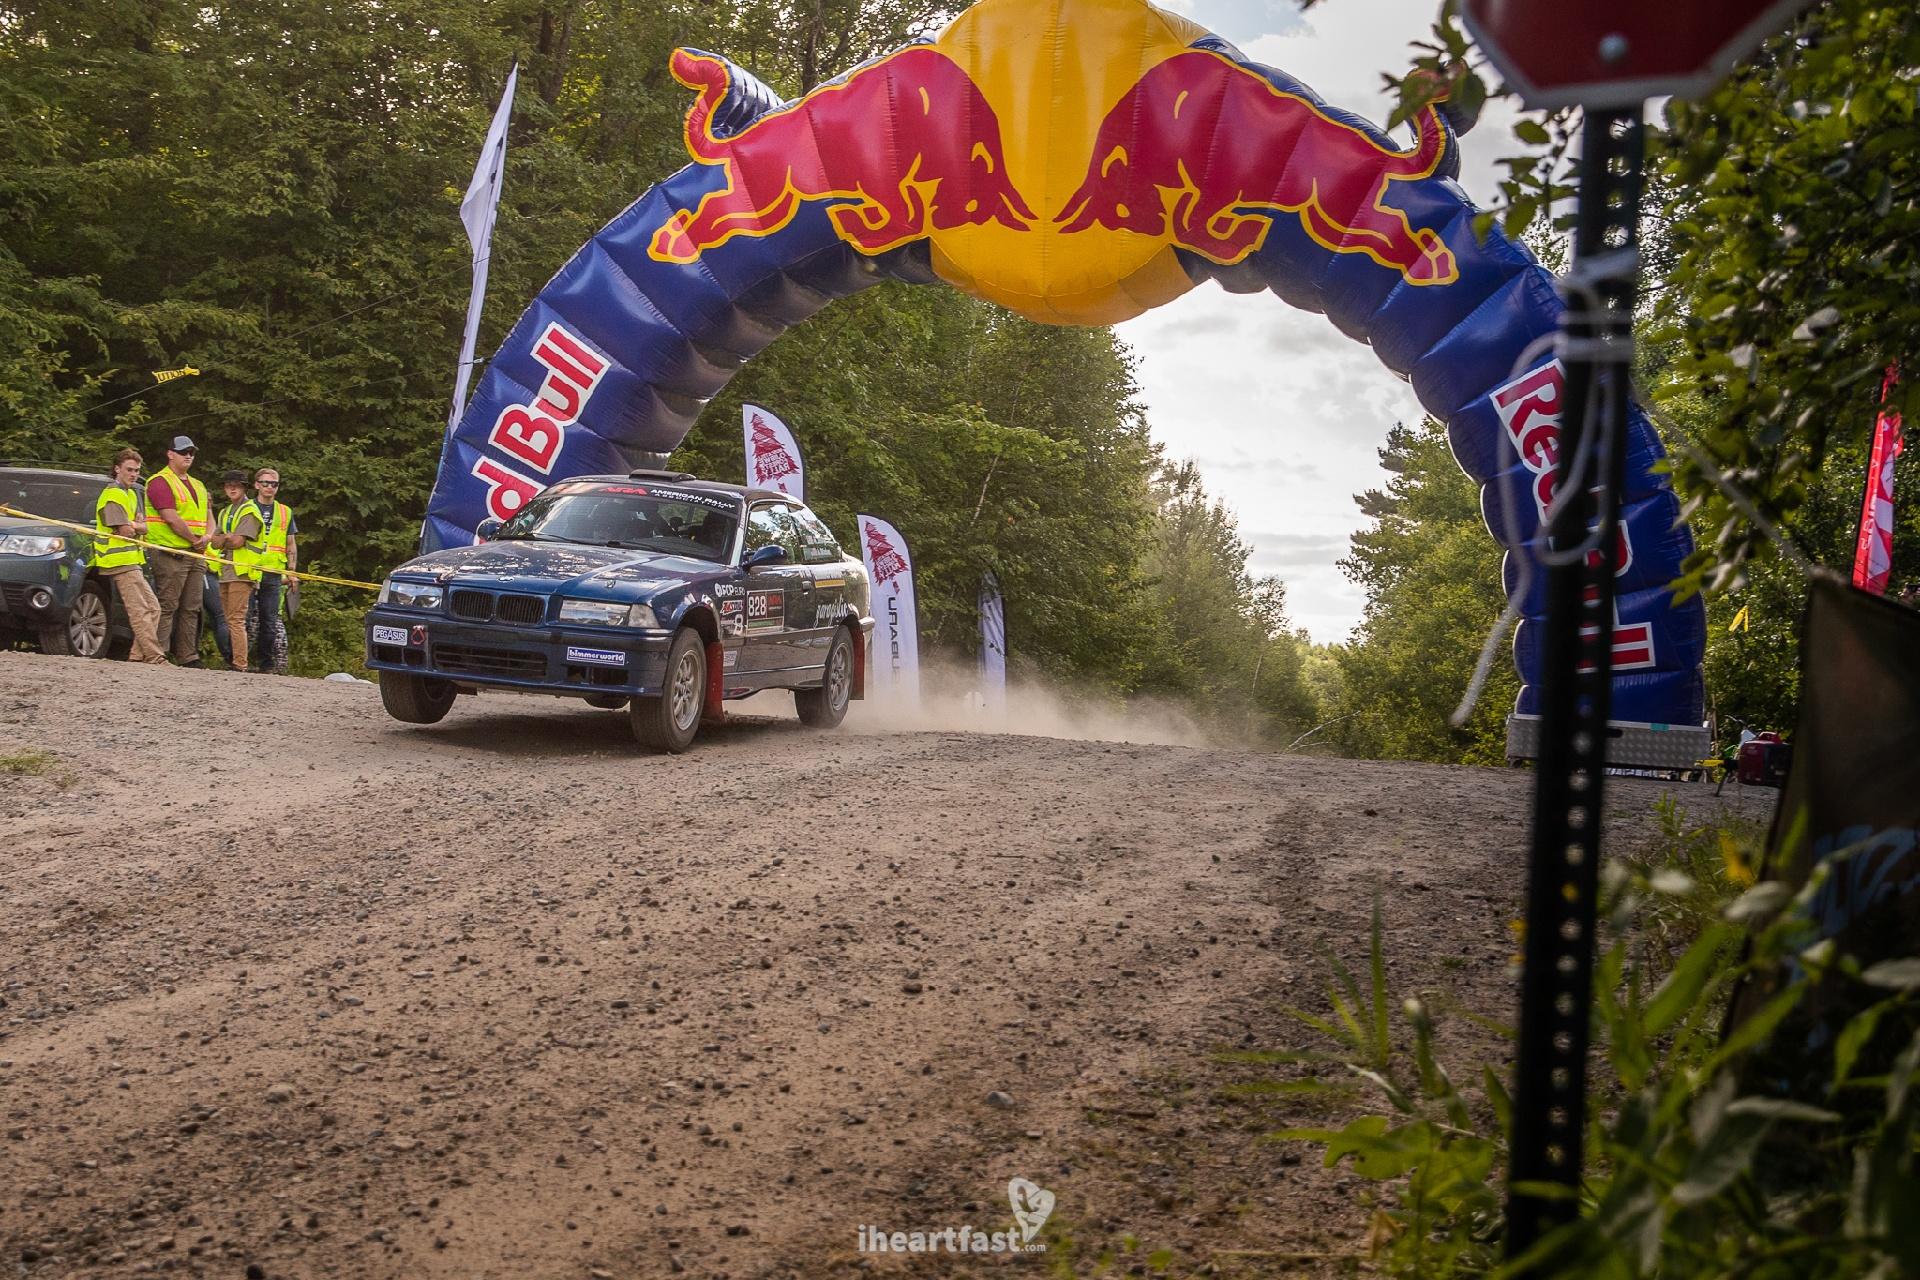 Bearded Ryno Rally Team Ojibwe Forests Rally Red Bull jump BMW E36 M3 Rallycar